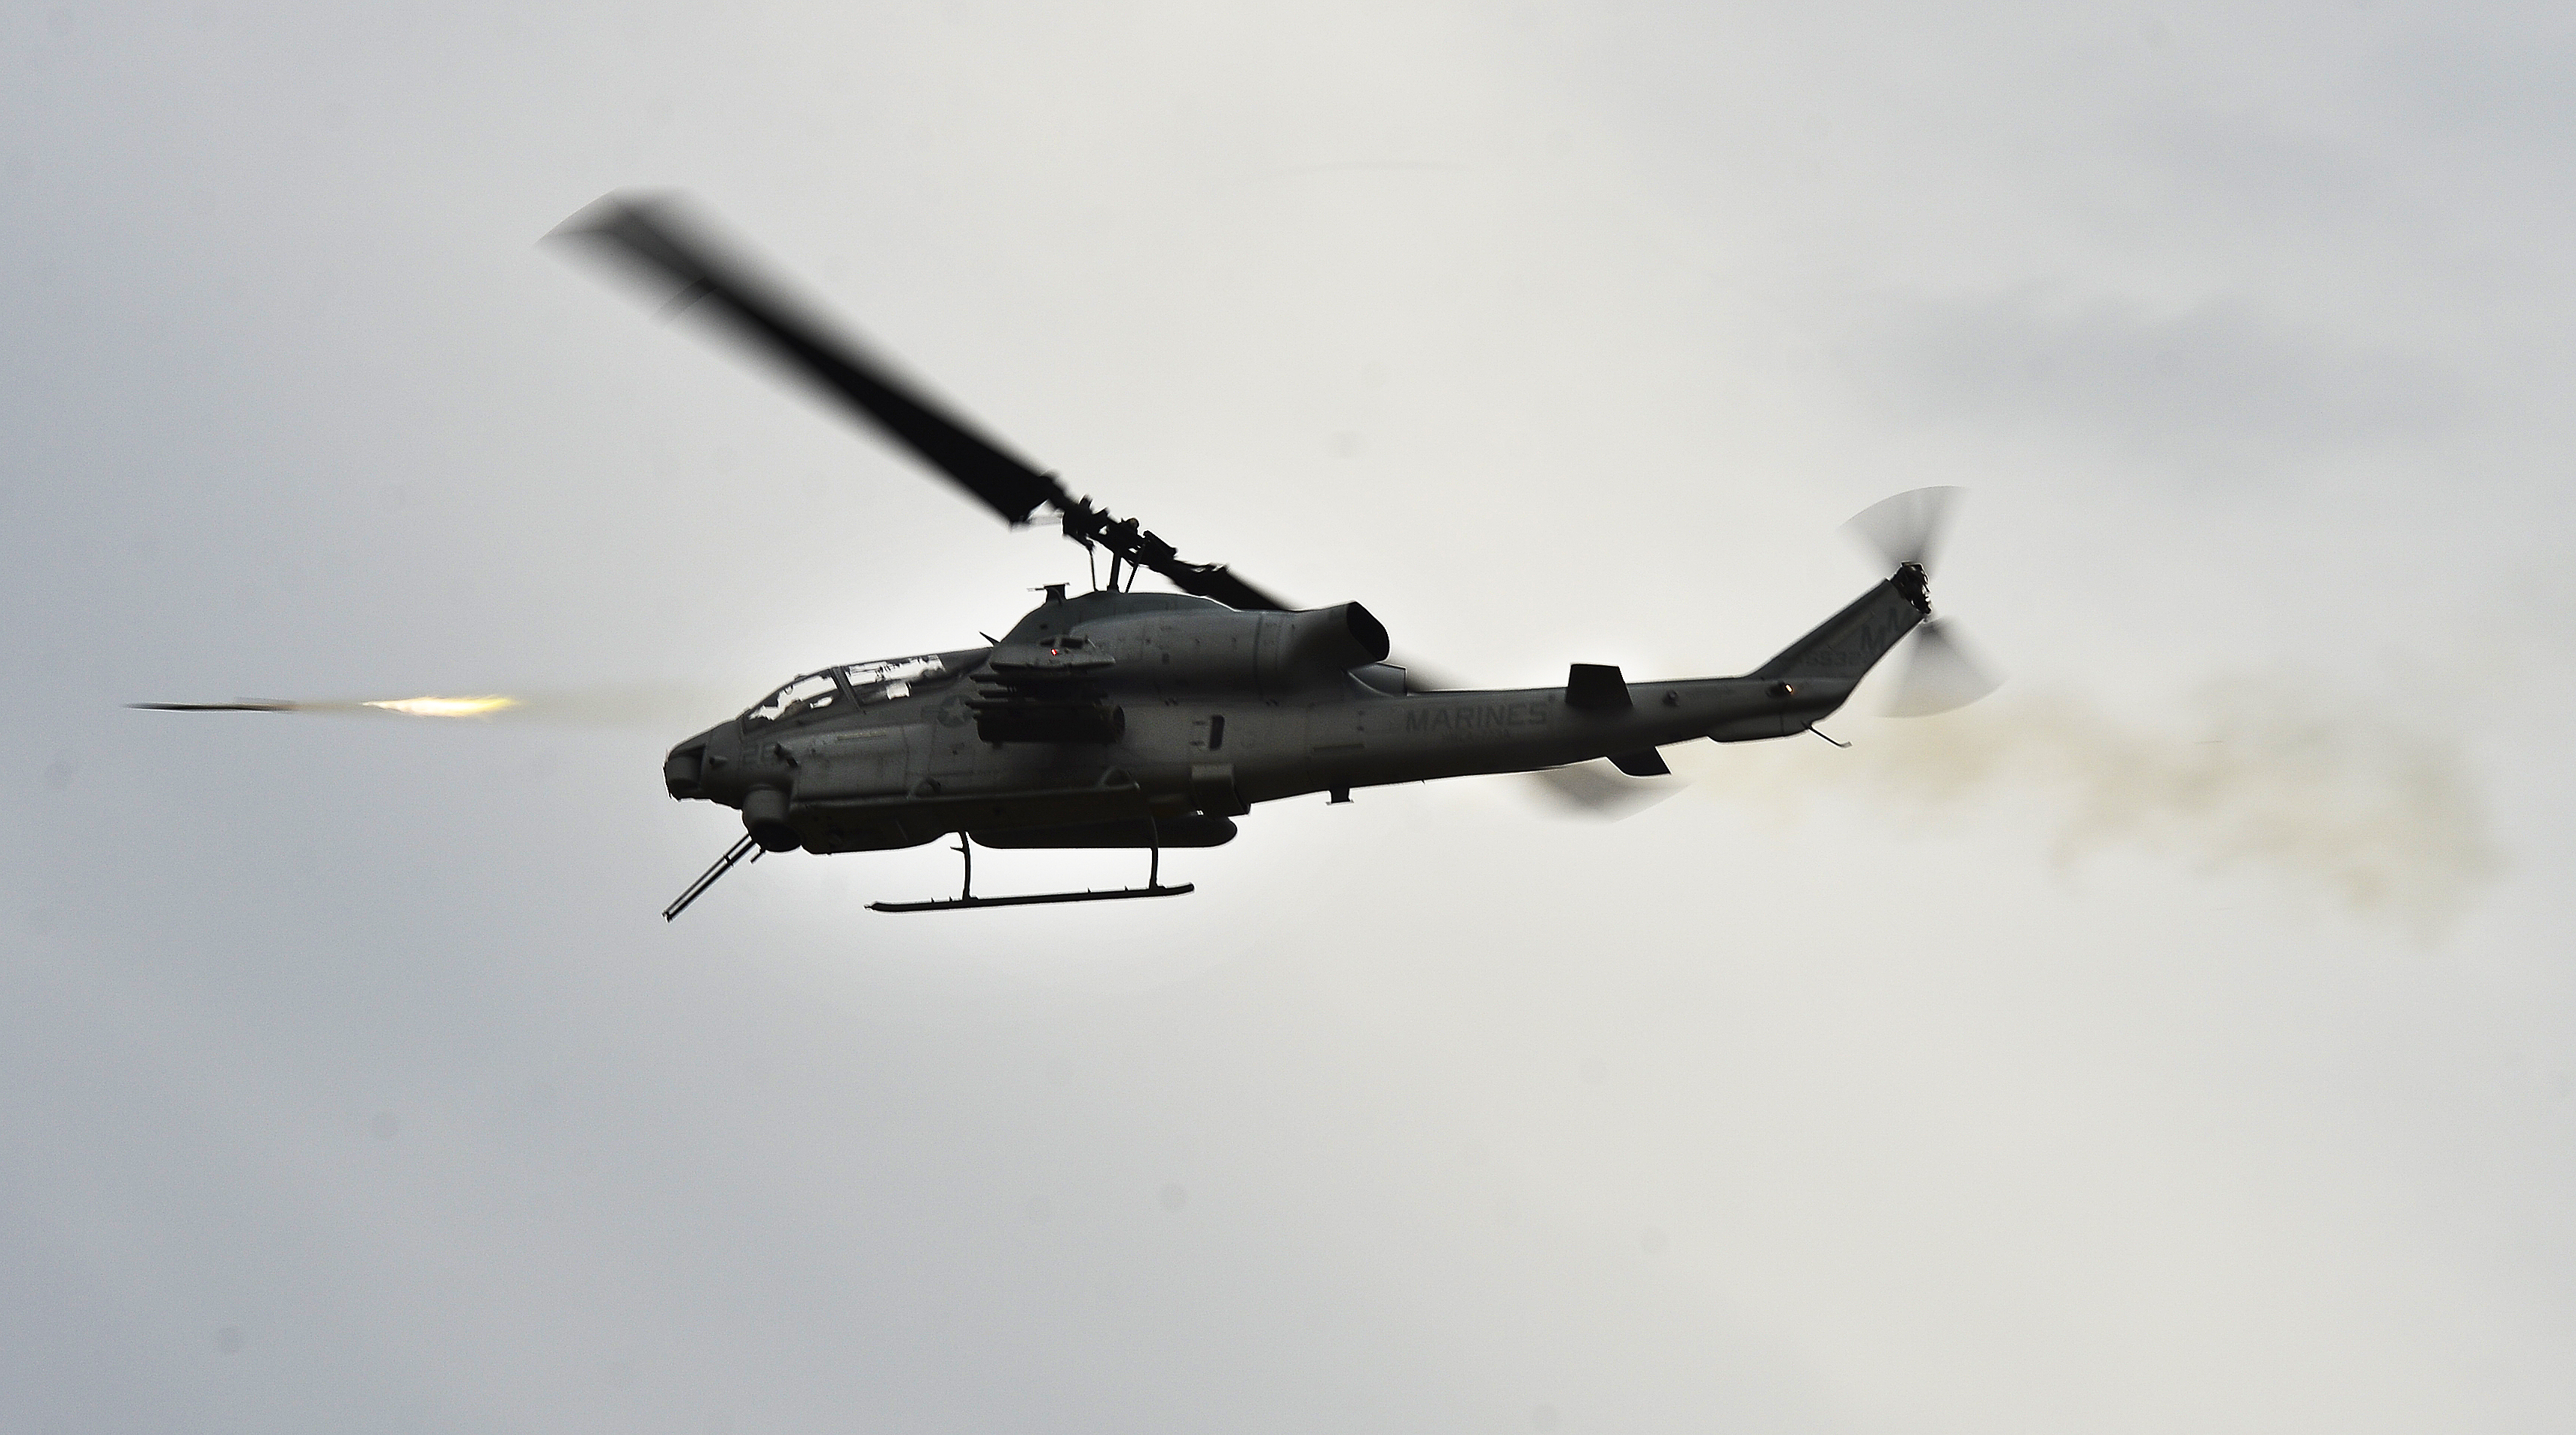 File:A U.S. Marine Corps AH-1W Super Cobra helicopter ...